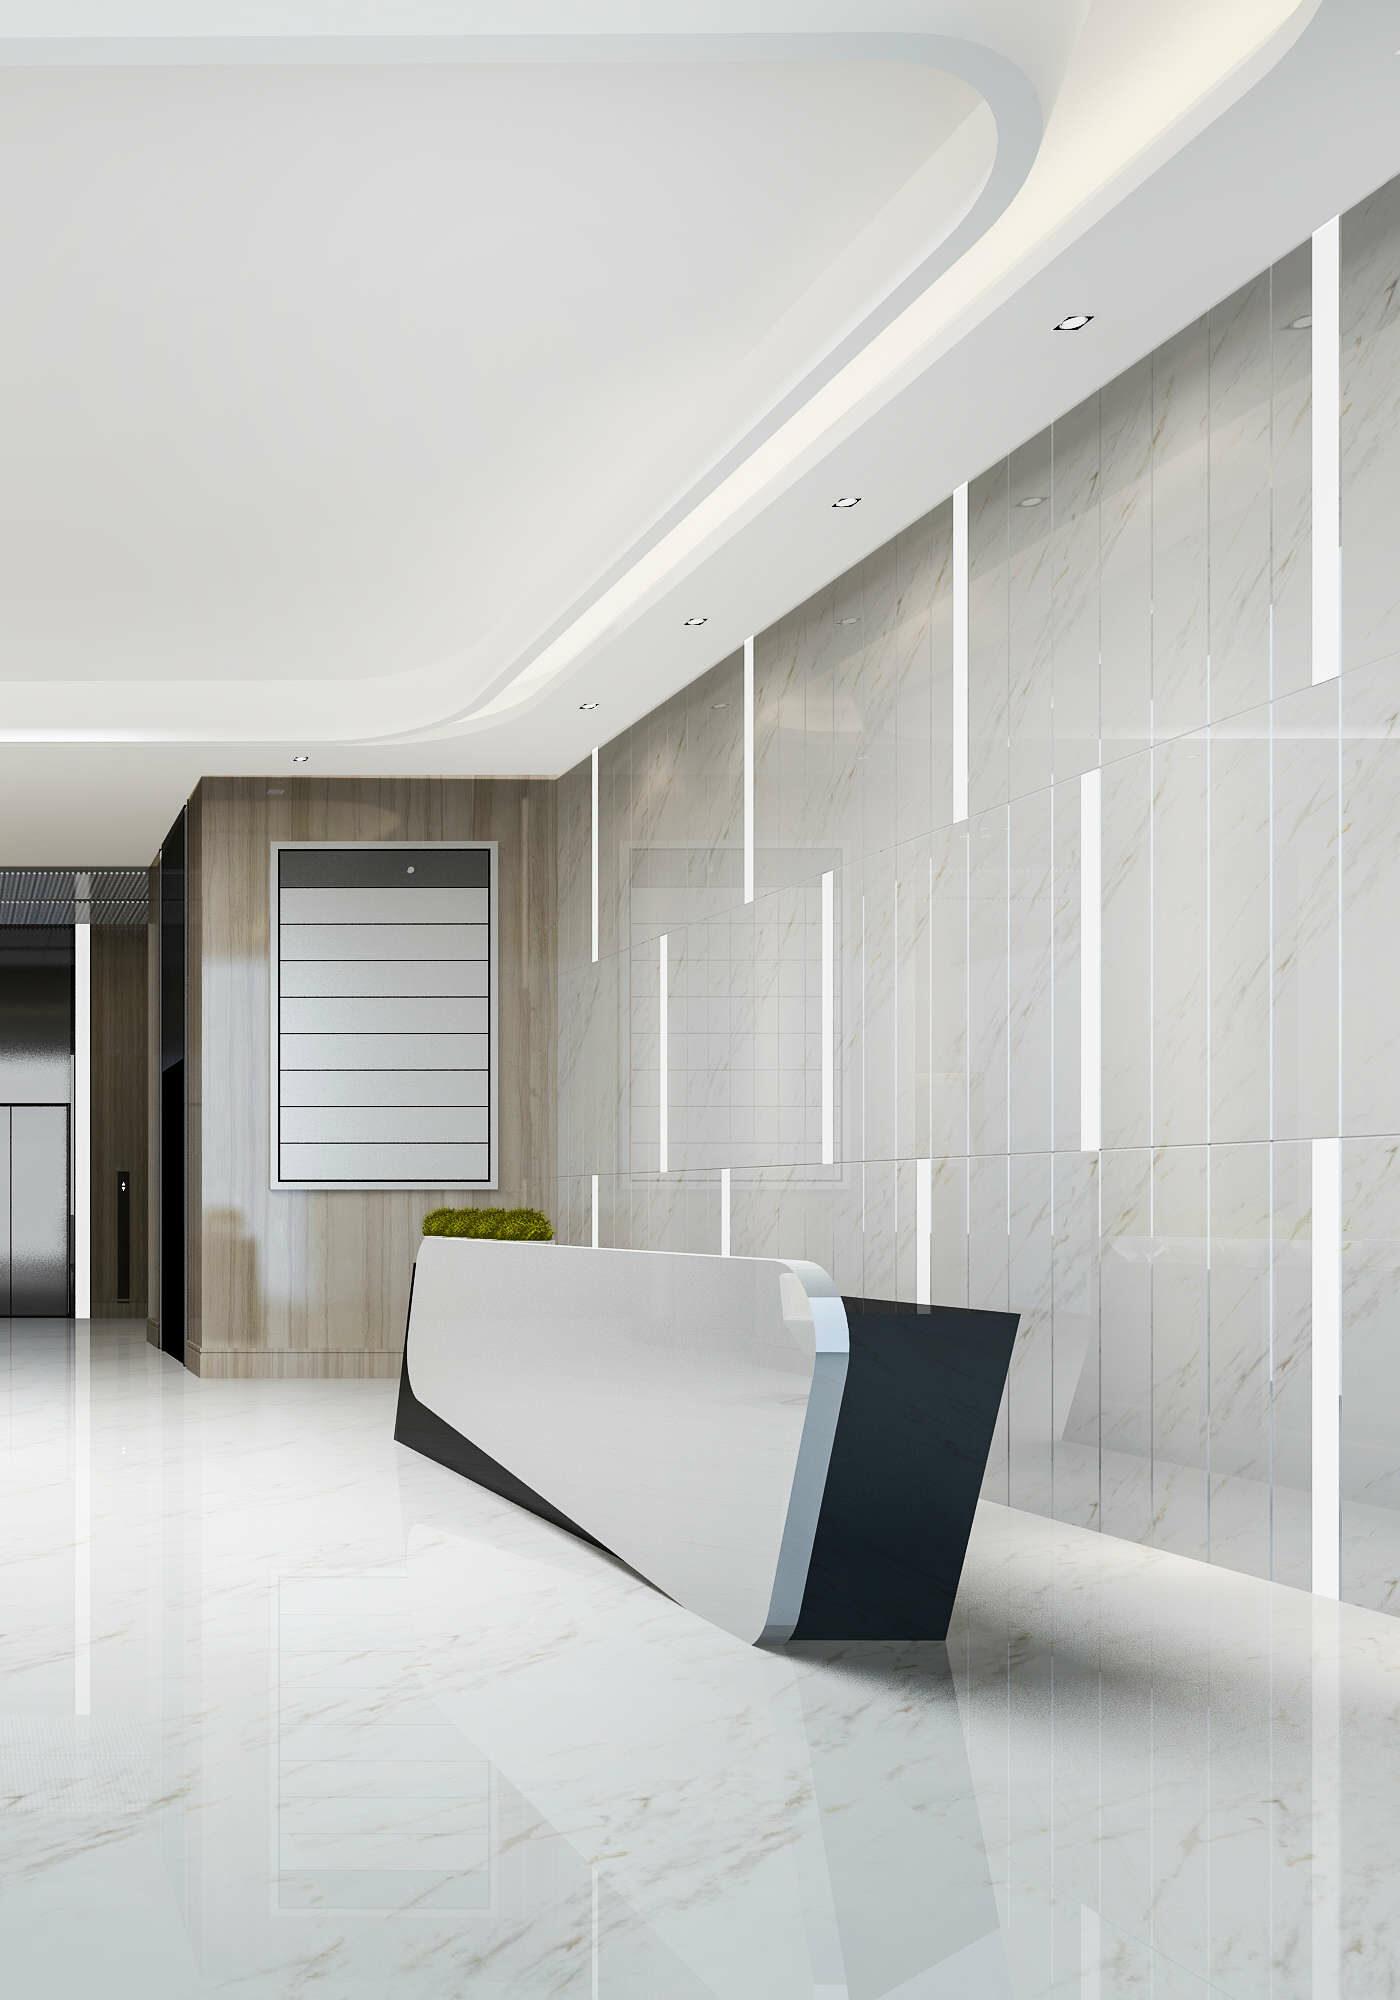 A bright office lobby